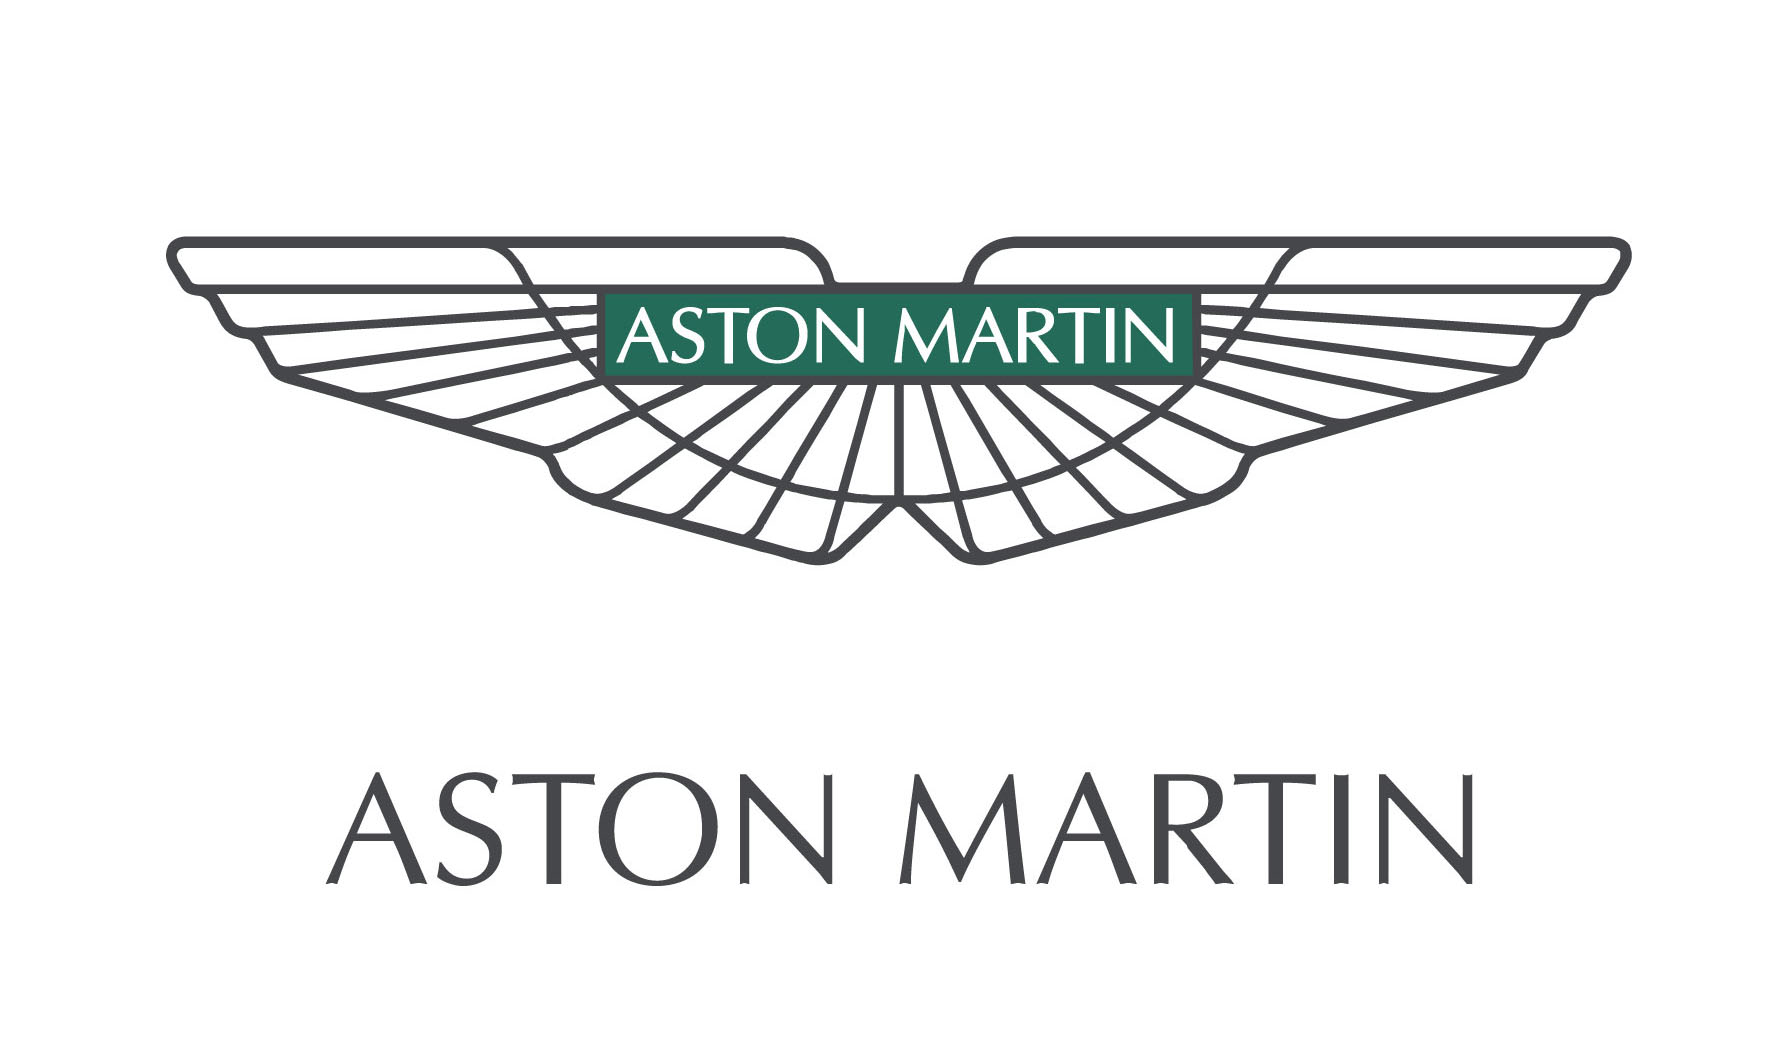 aston-martin-logo - trading game